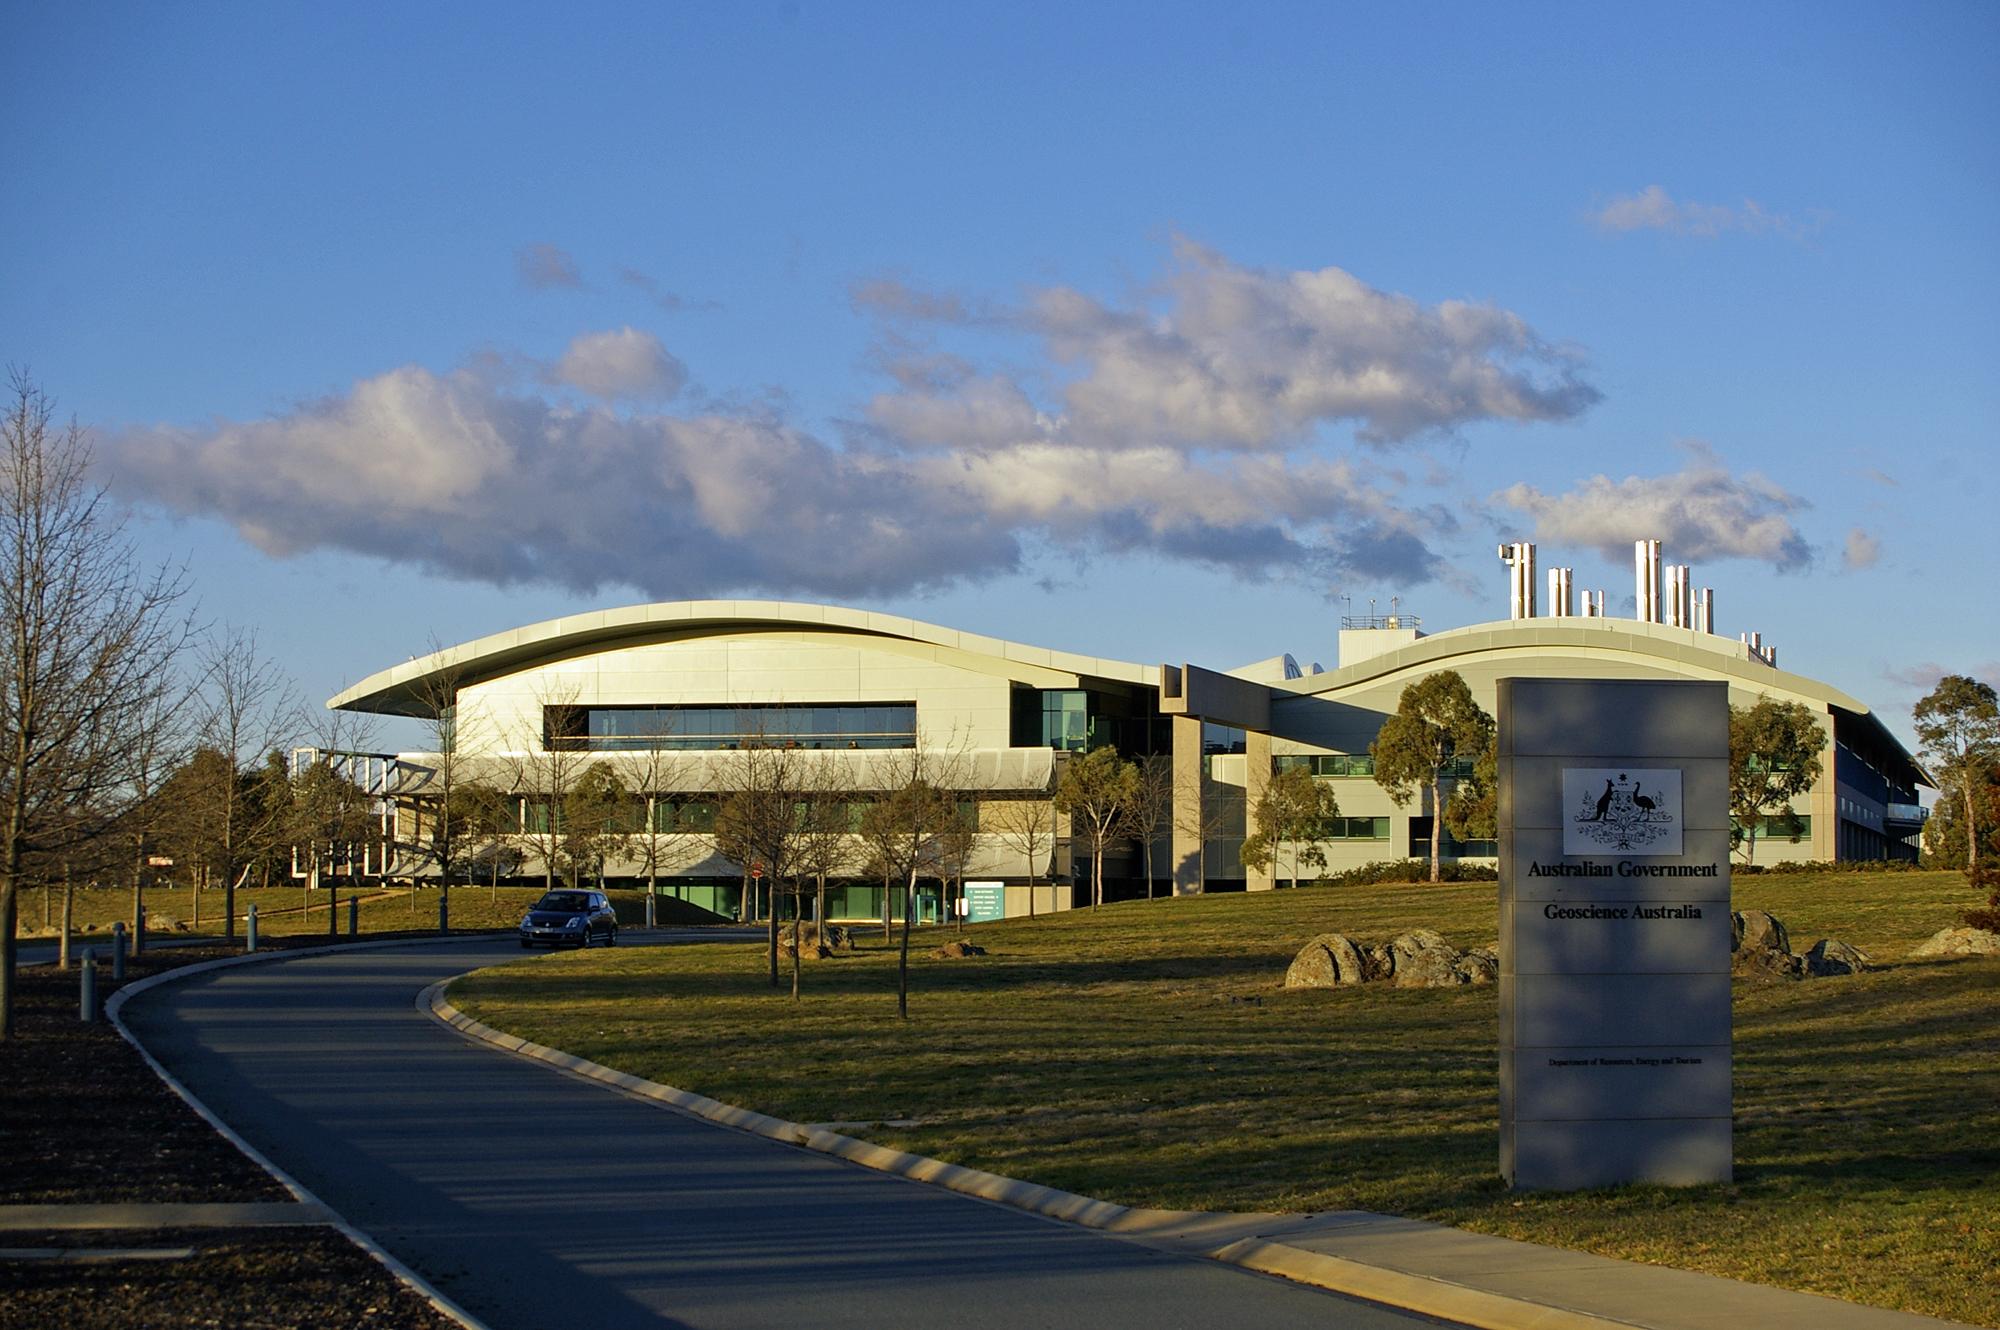 Geoscience Australia Headquarters